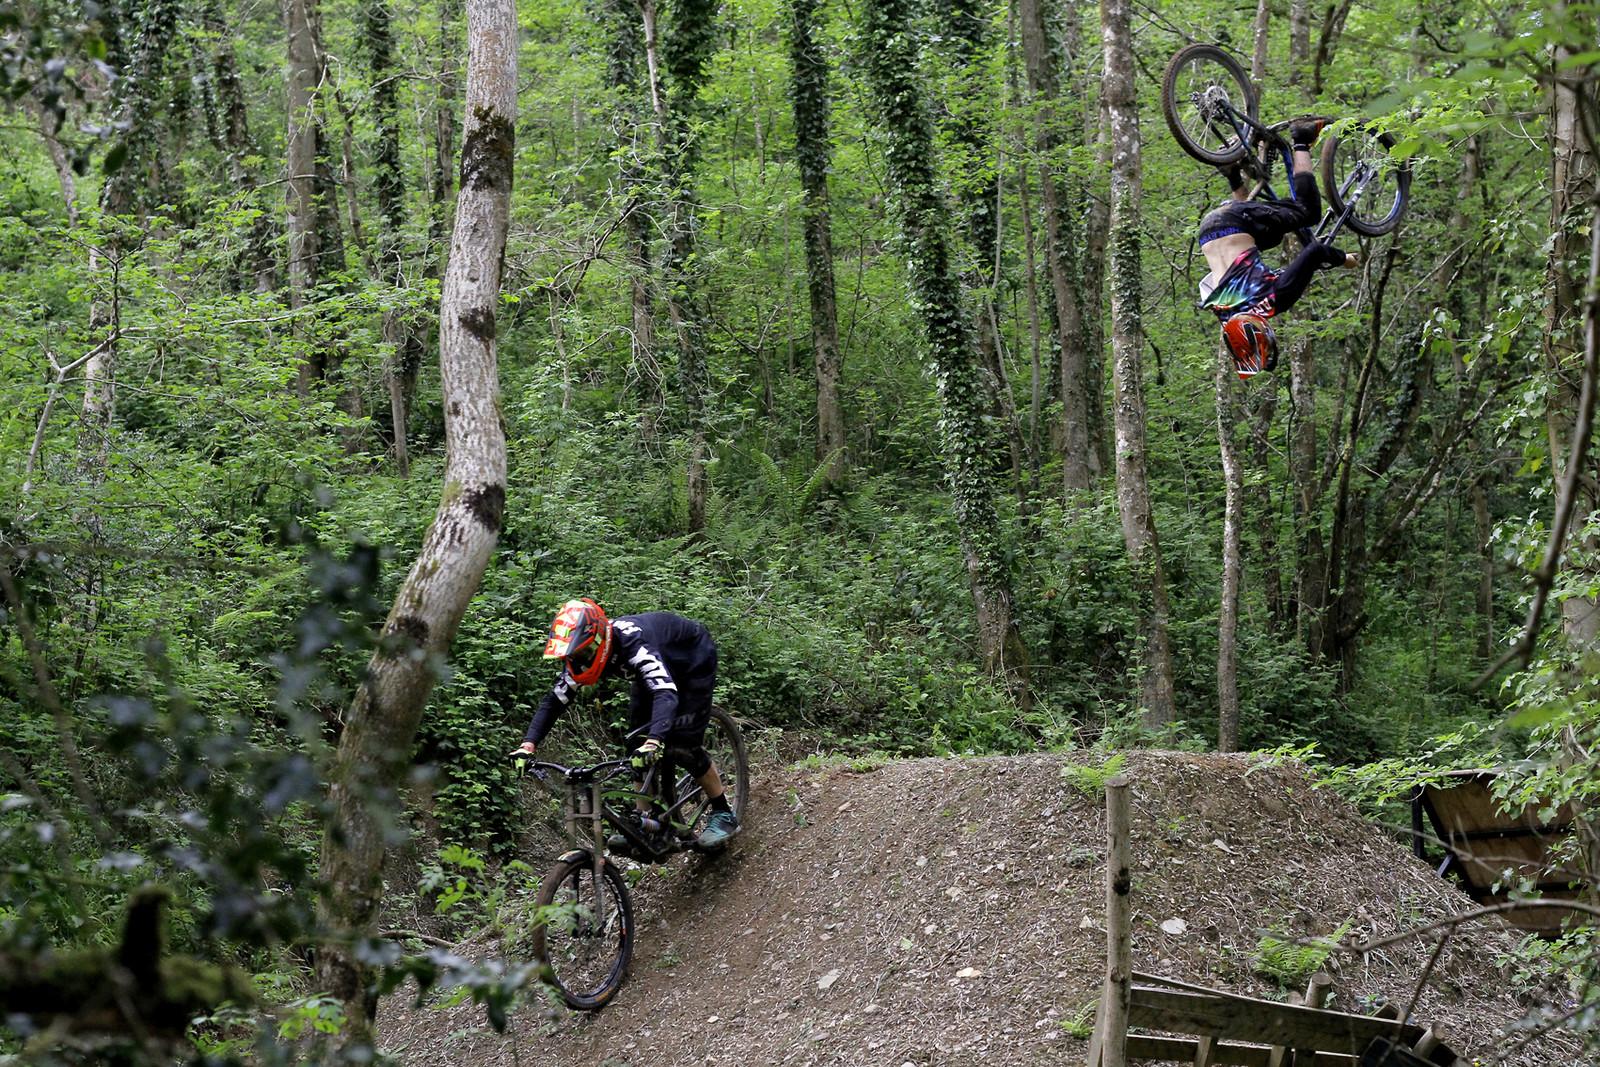 Backflip train - CaldwellVisuals - Mountain Biking Pictures - Vital MTB